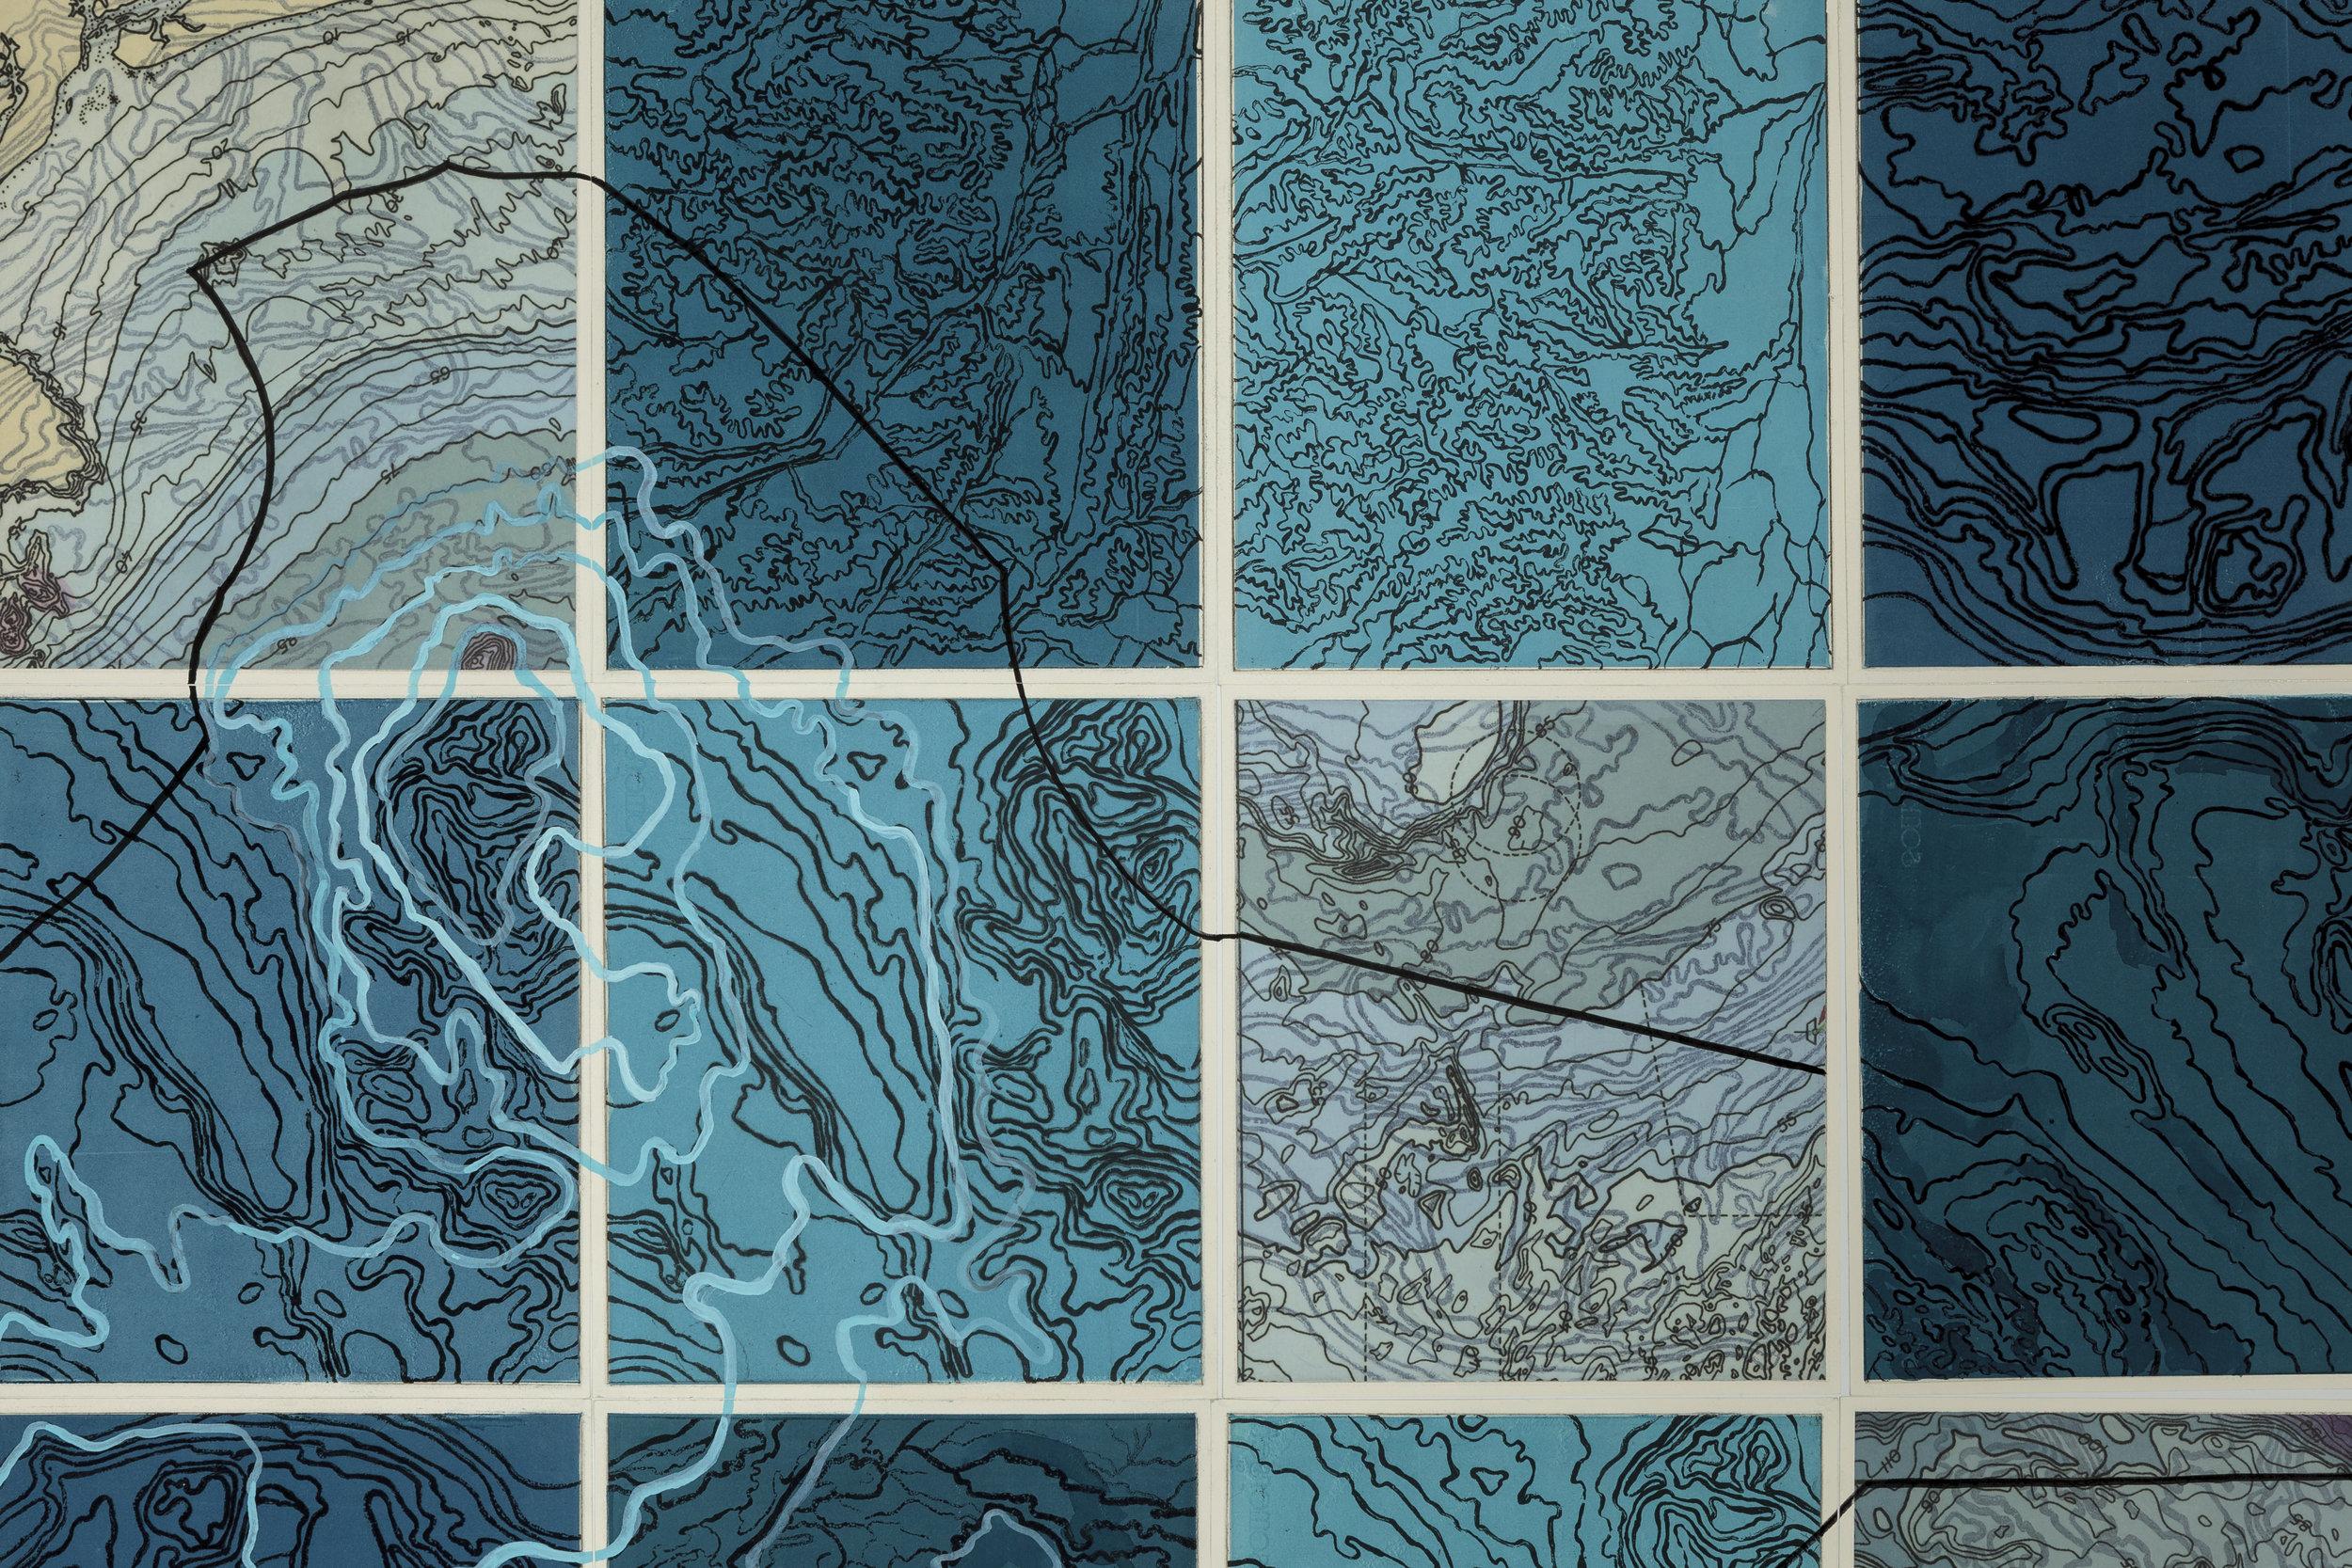 Parvar/Sagar, 2 017   Detail - intaglio sugar lift, line etching, surface roll, digital map on kozo-shi, paint